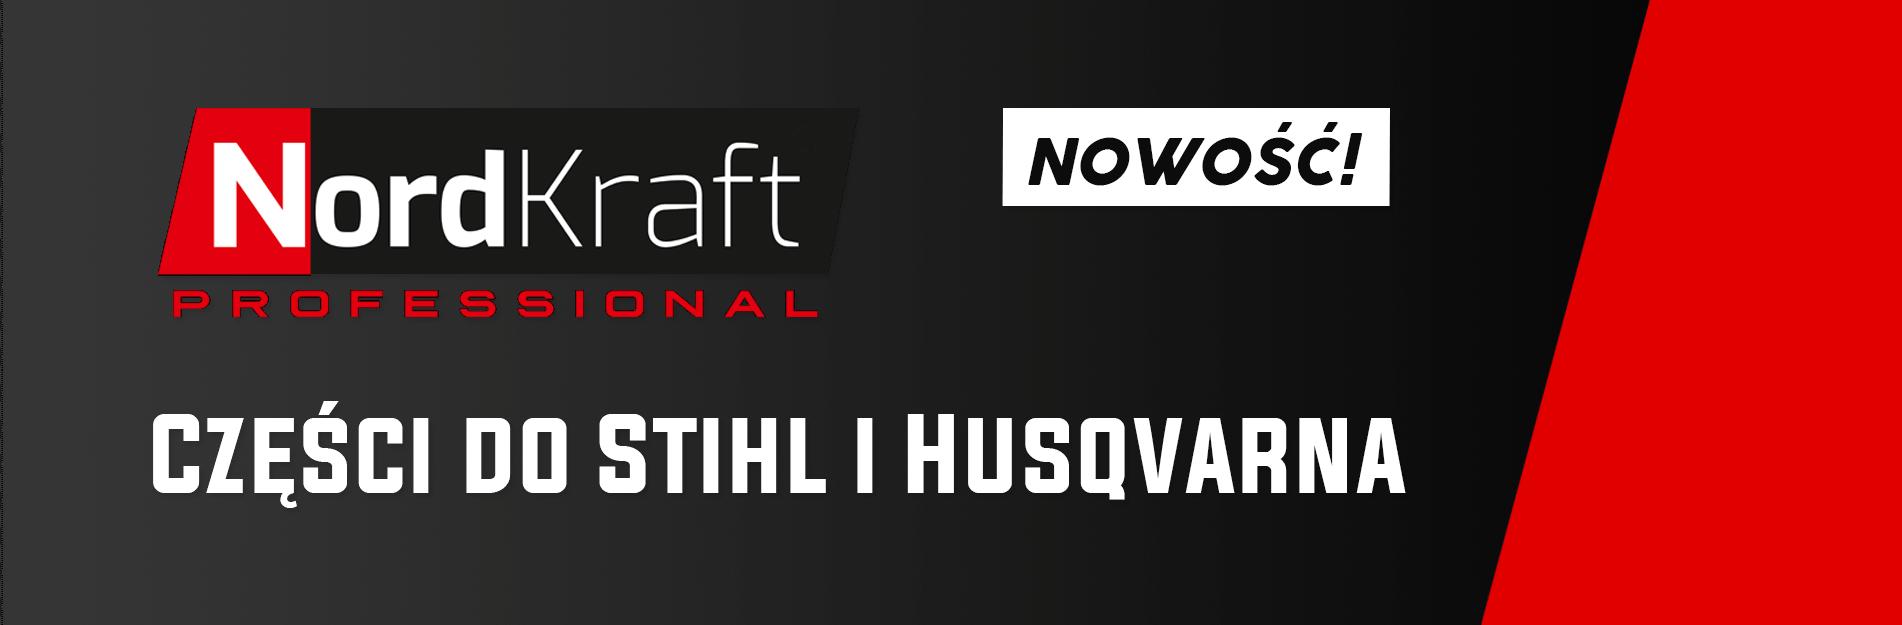 nordkraft-czesci-stihl-husqvarna